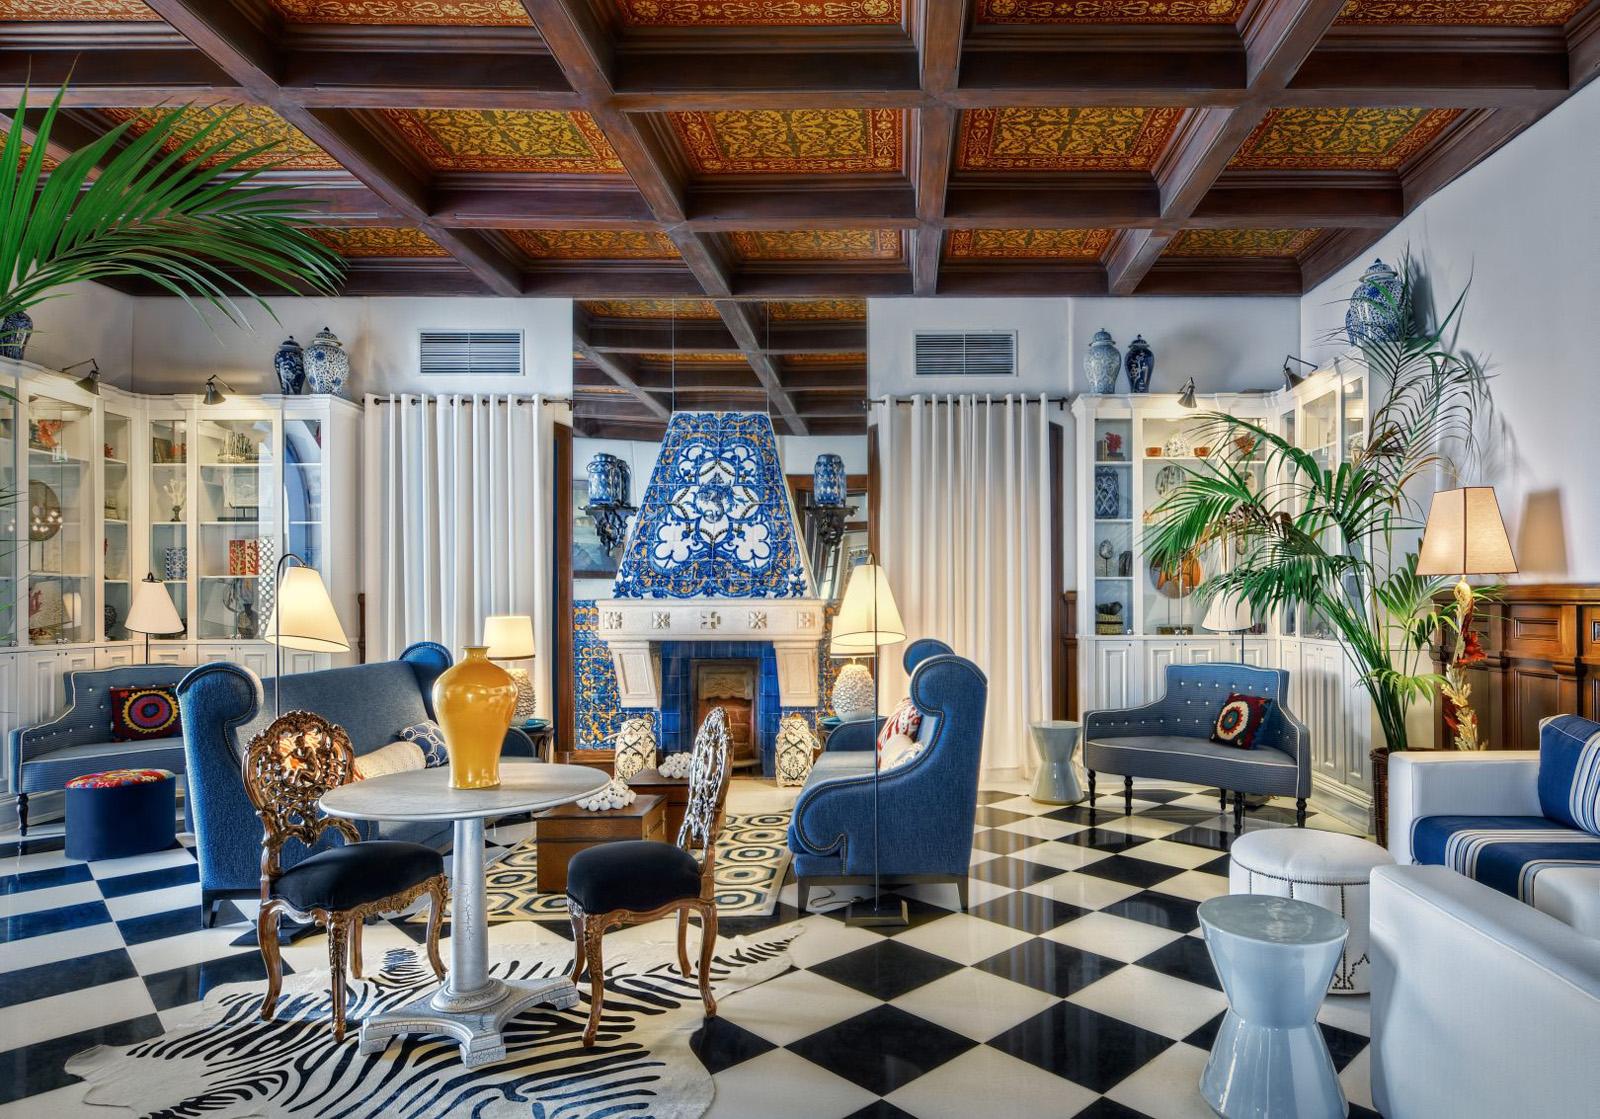 hotel bela vista eclectic interiors - Eclectic Hotel 2015